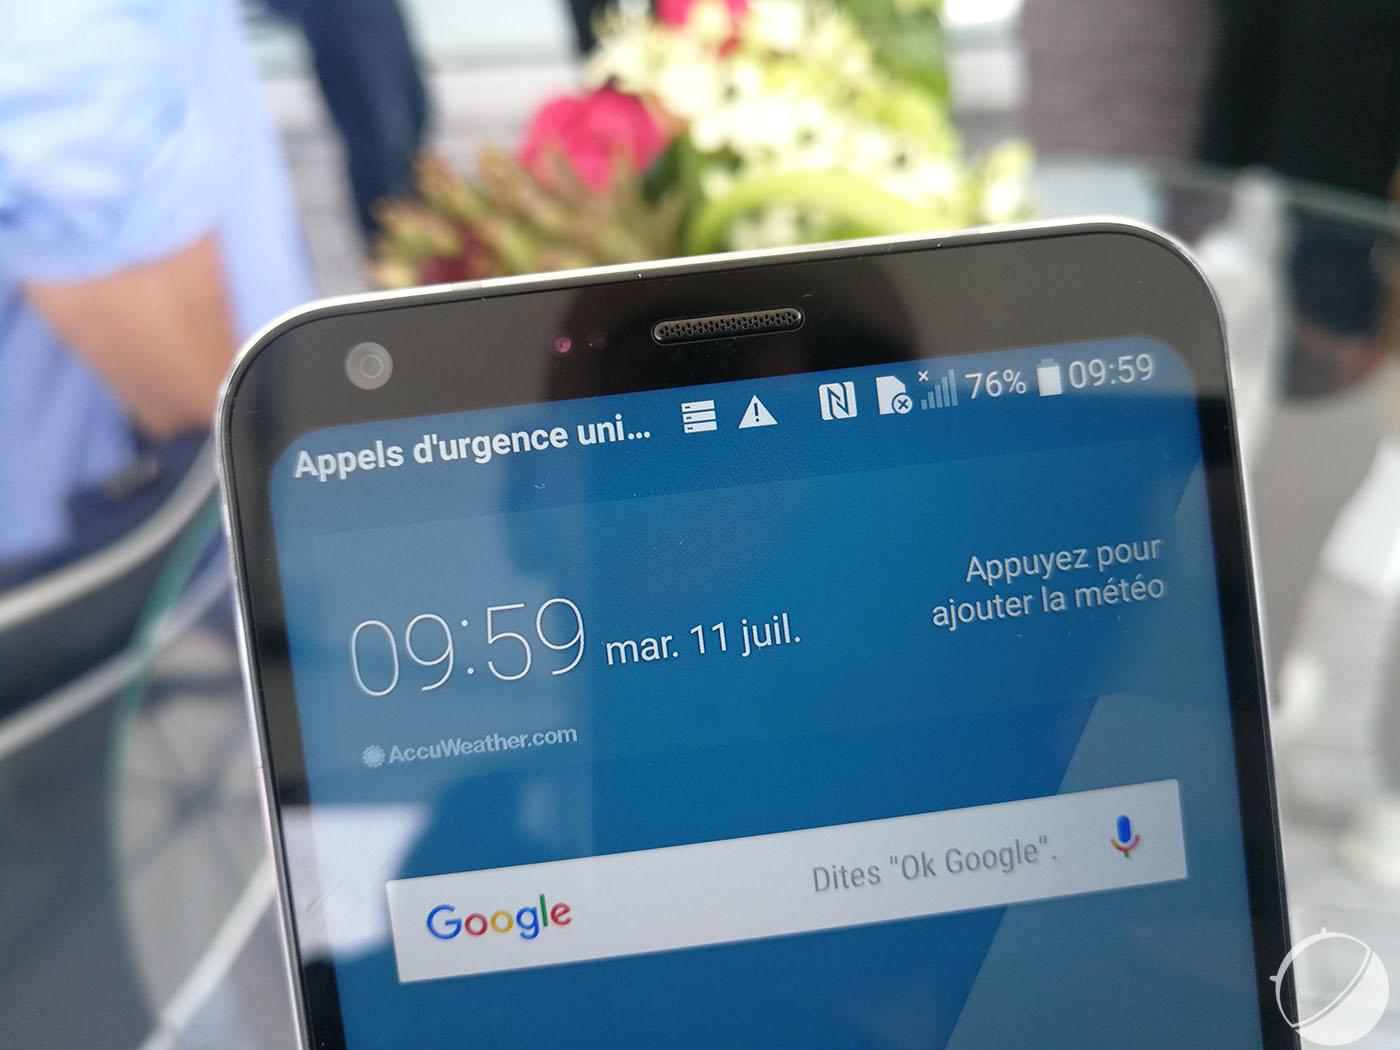 Tech'spresso : LG Q6, Galaxy Note 7 reconditionné et LG V30